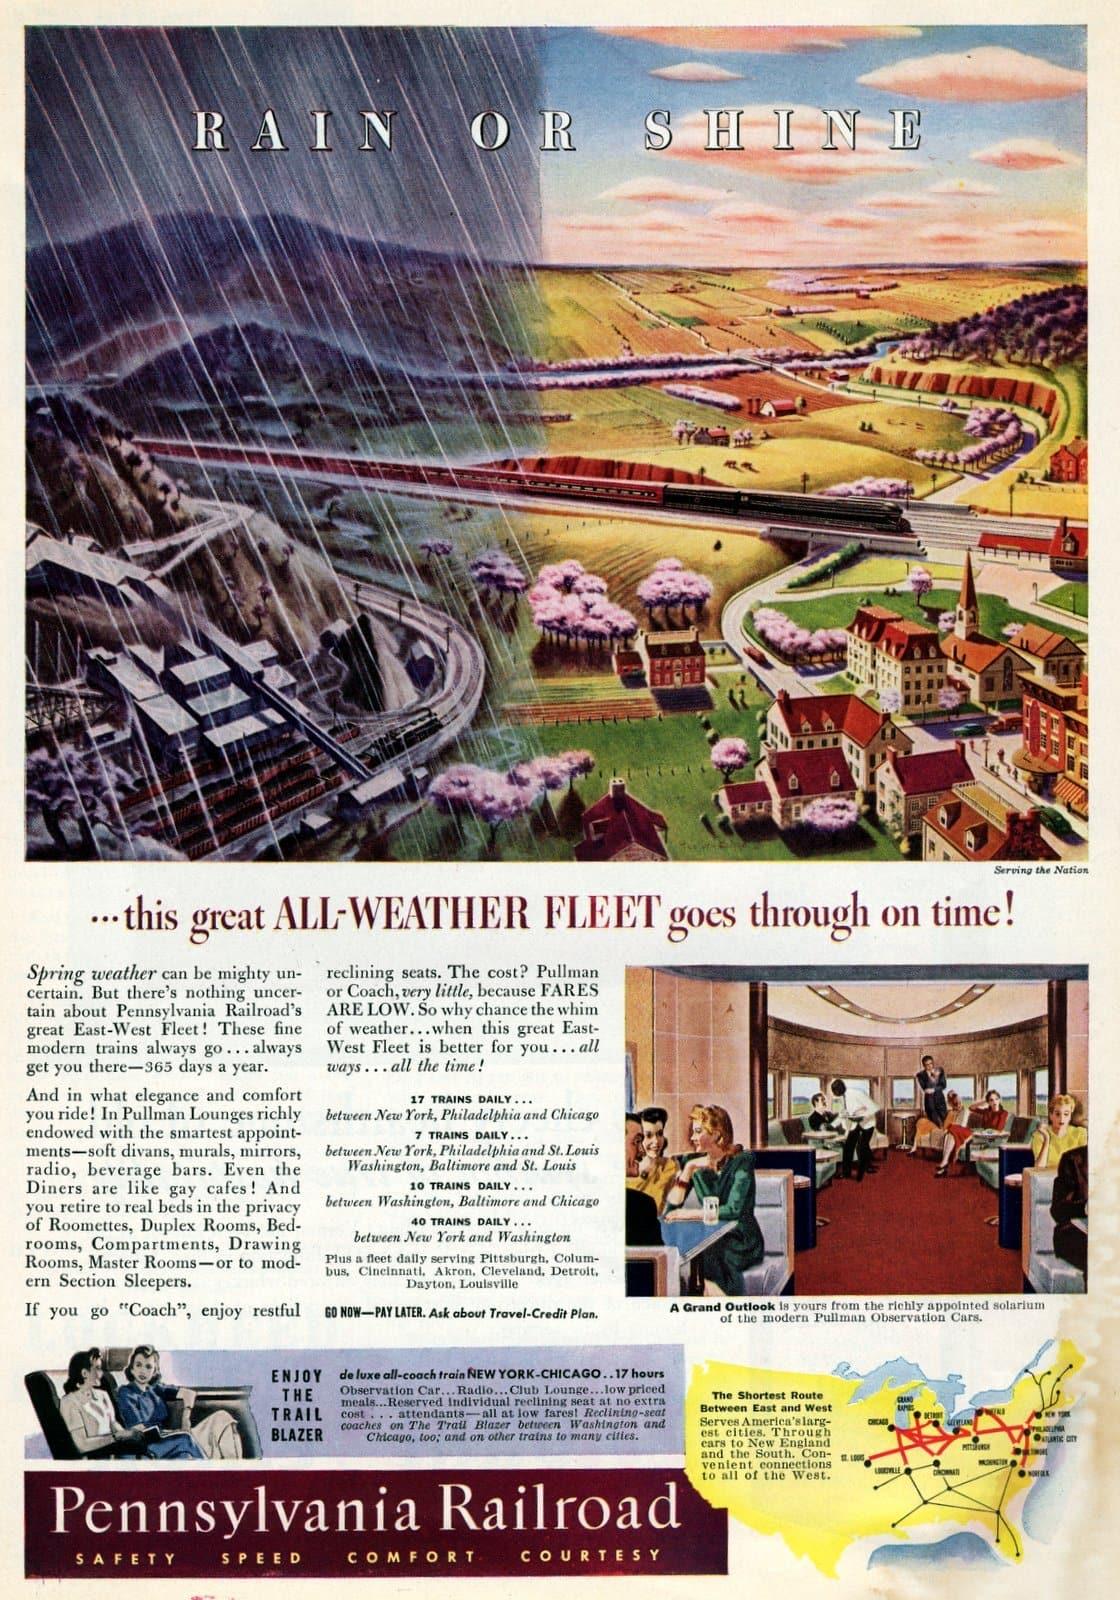 Pennsylvania Railroad's great East-West Fleet (1941)